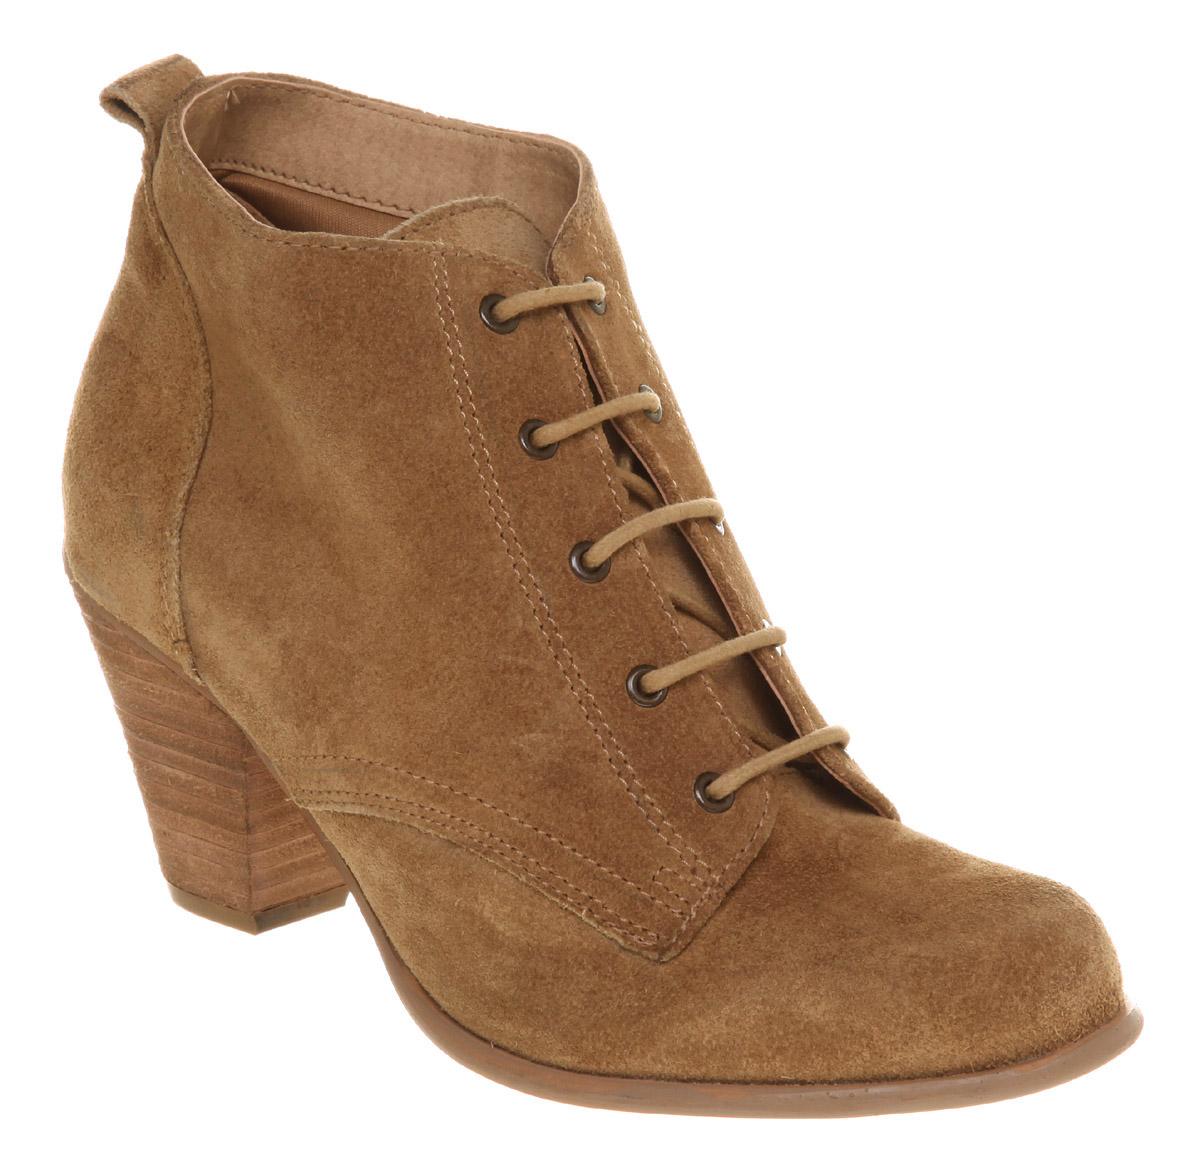 office kurtis lace up boot beige suede in beige lyst